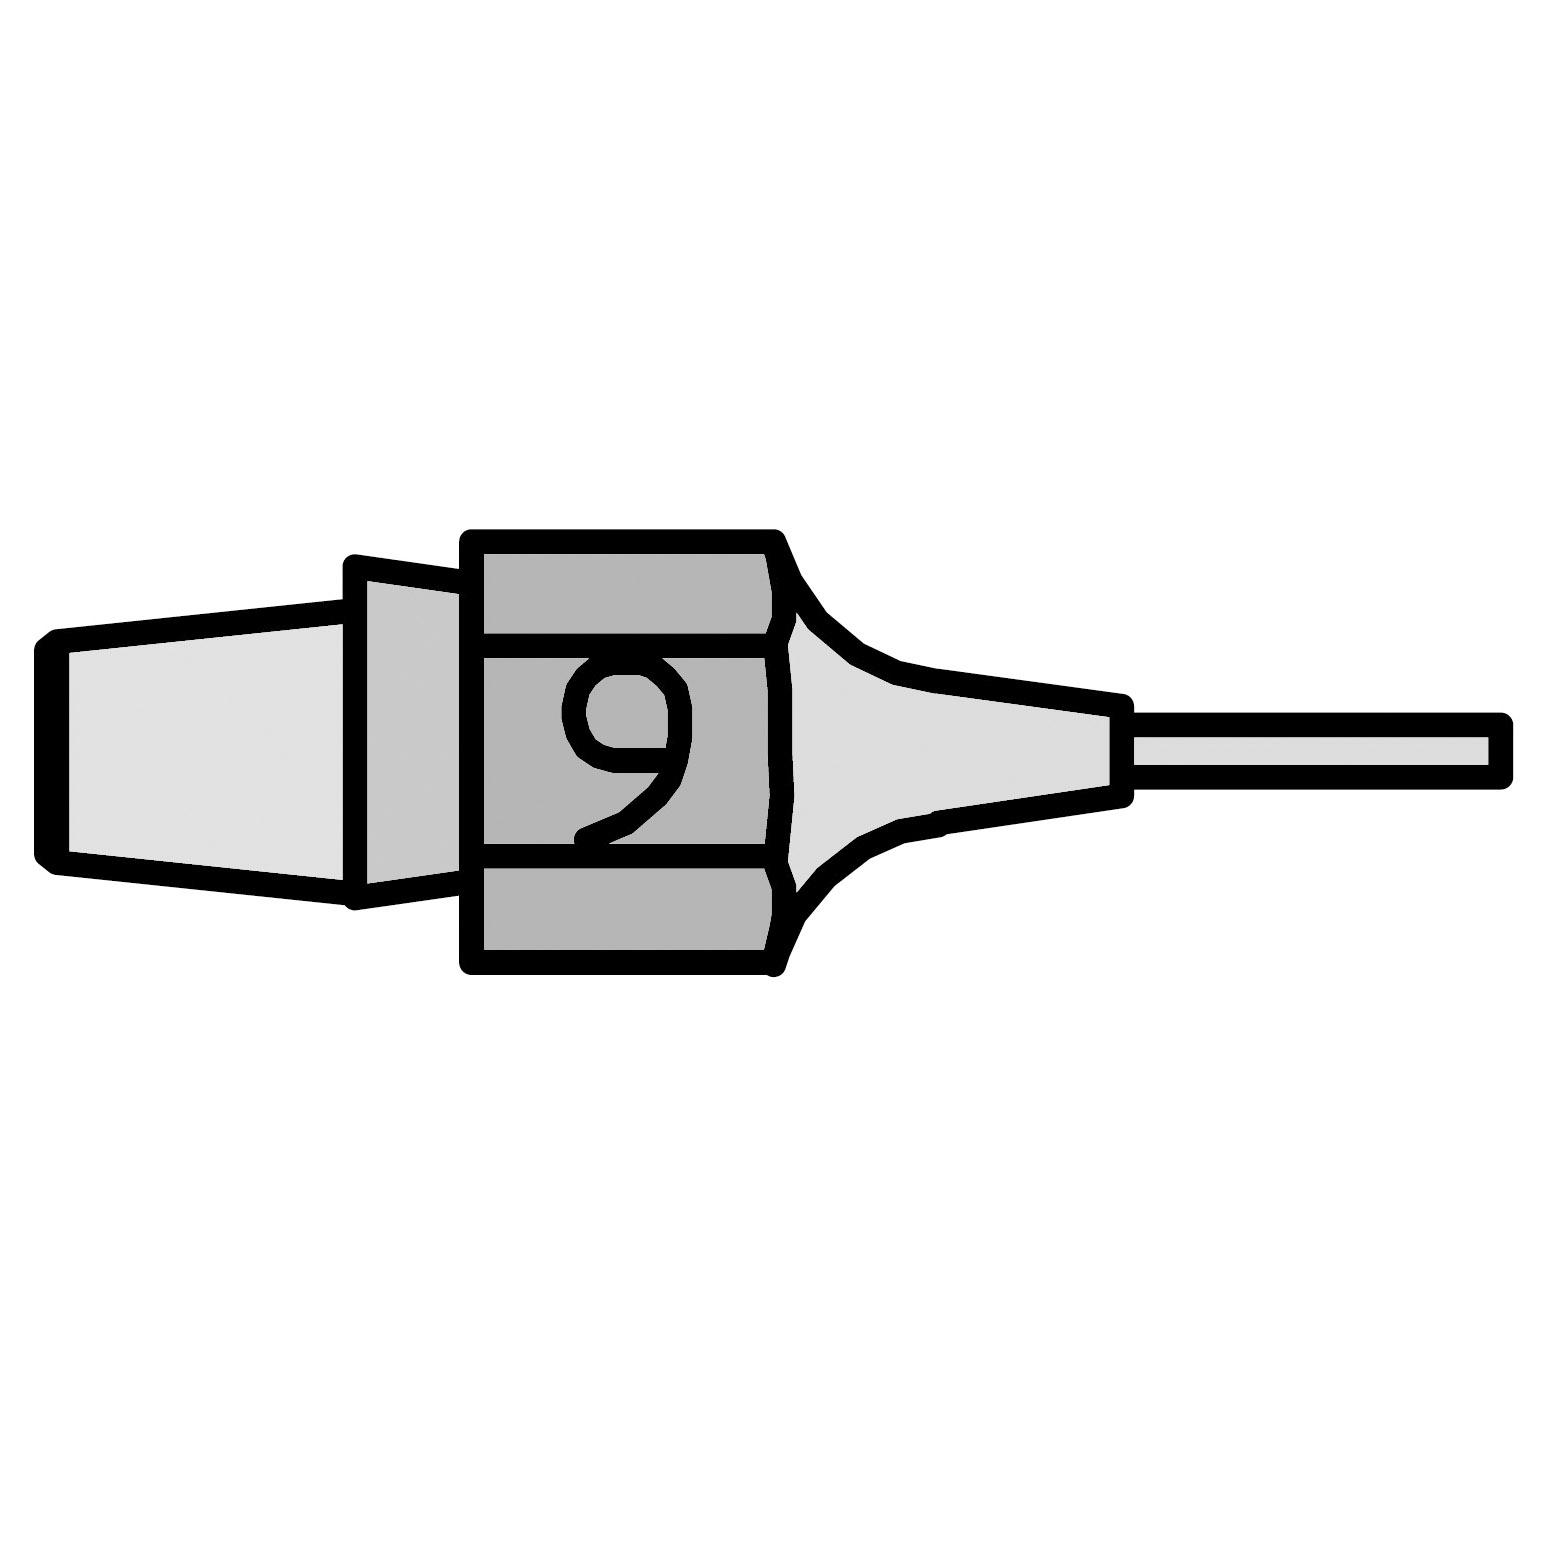 DX 119 Desoldering Nozzle